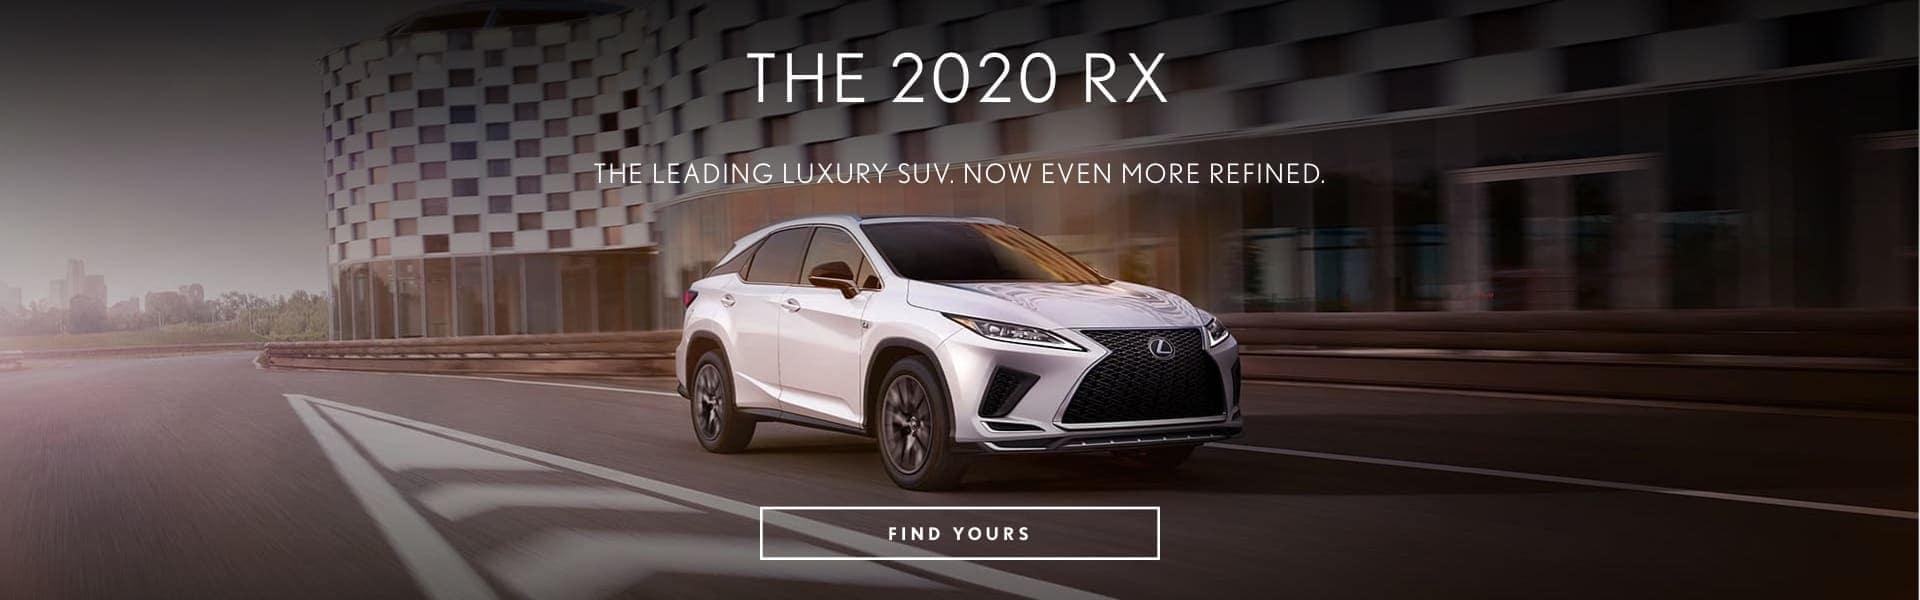 2020 rx